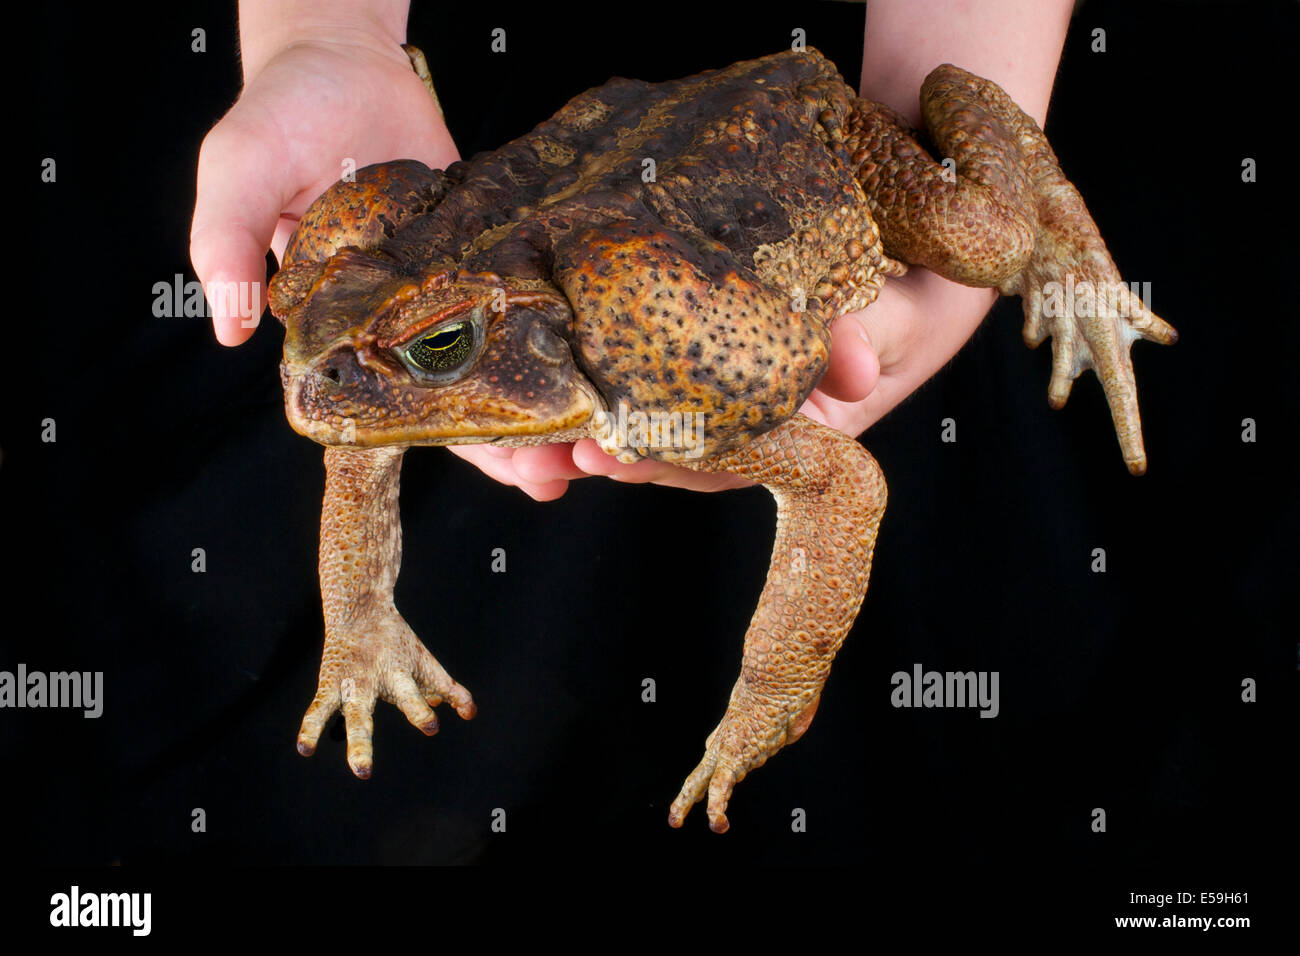 Cane toad / Rhinella marina - Stock Image